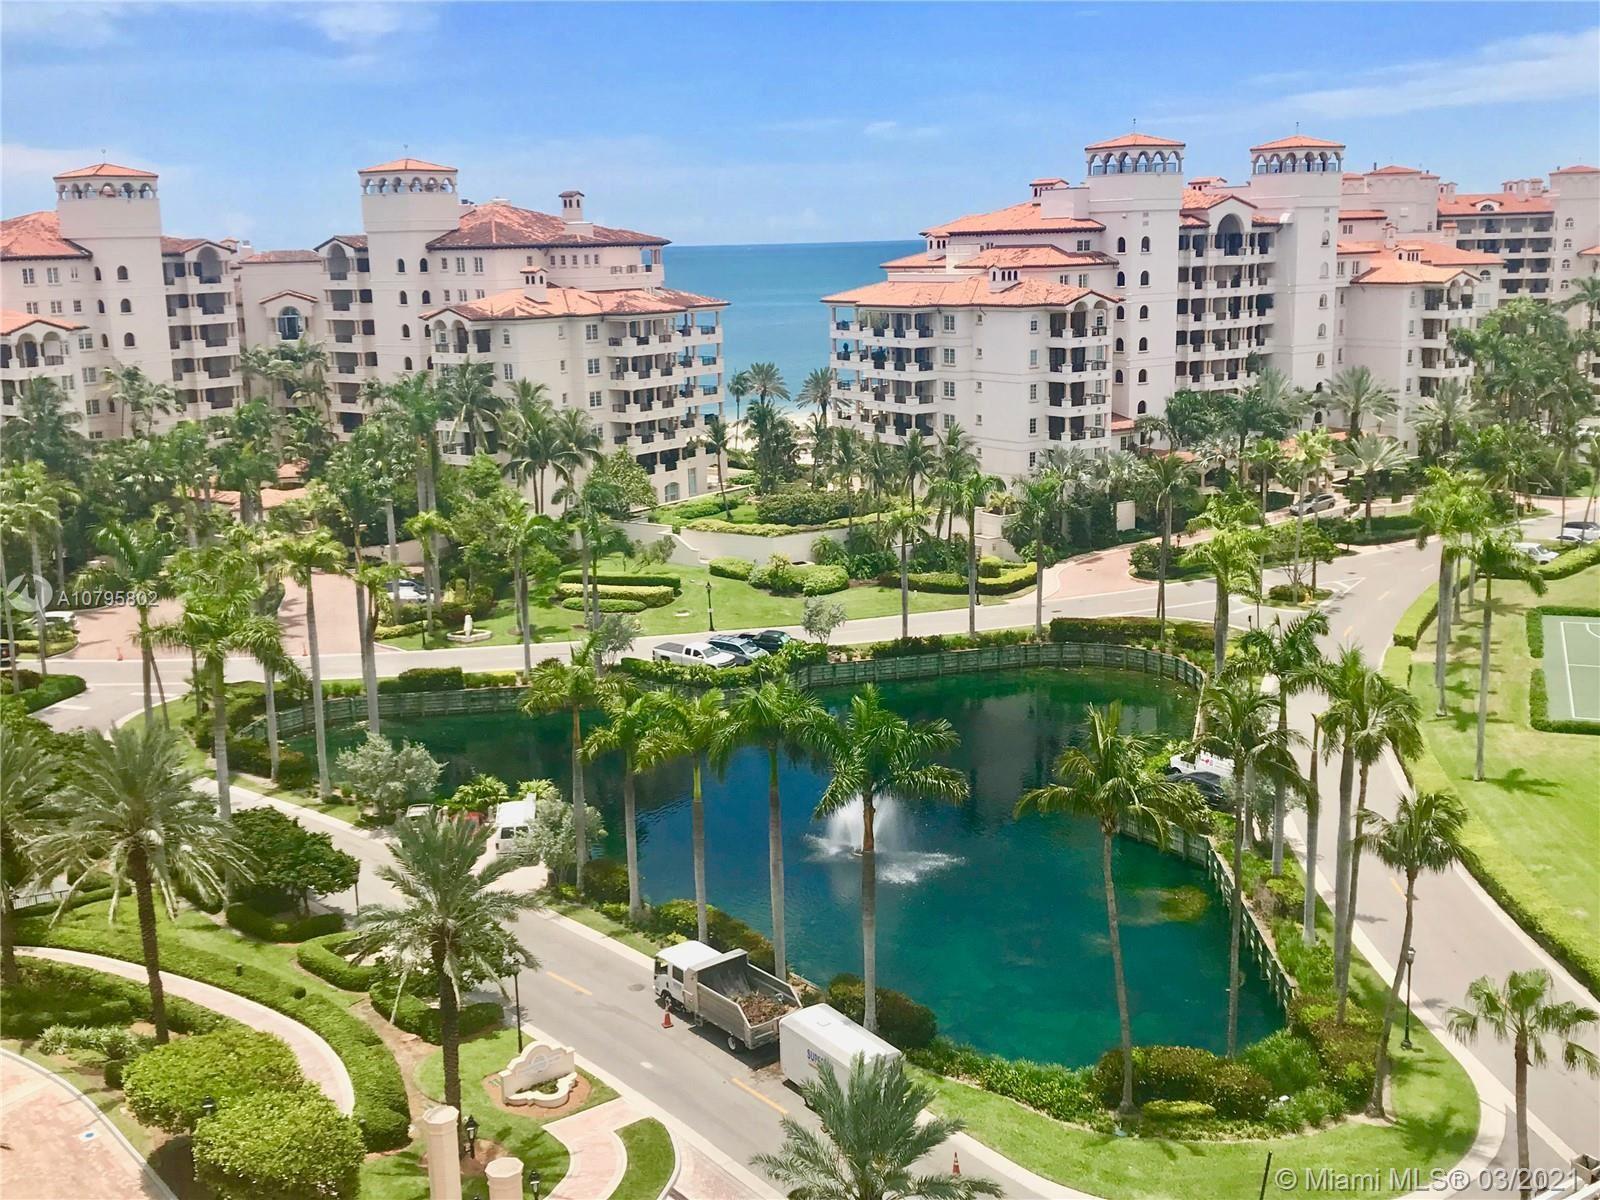 7066 Fisher Island Dr #7066, Miami Beach, FL 33109 - #: A10795802